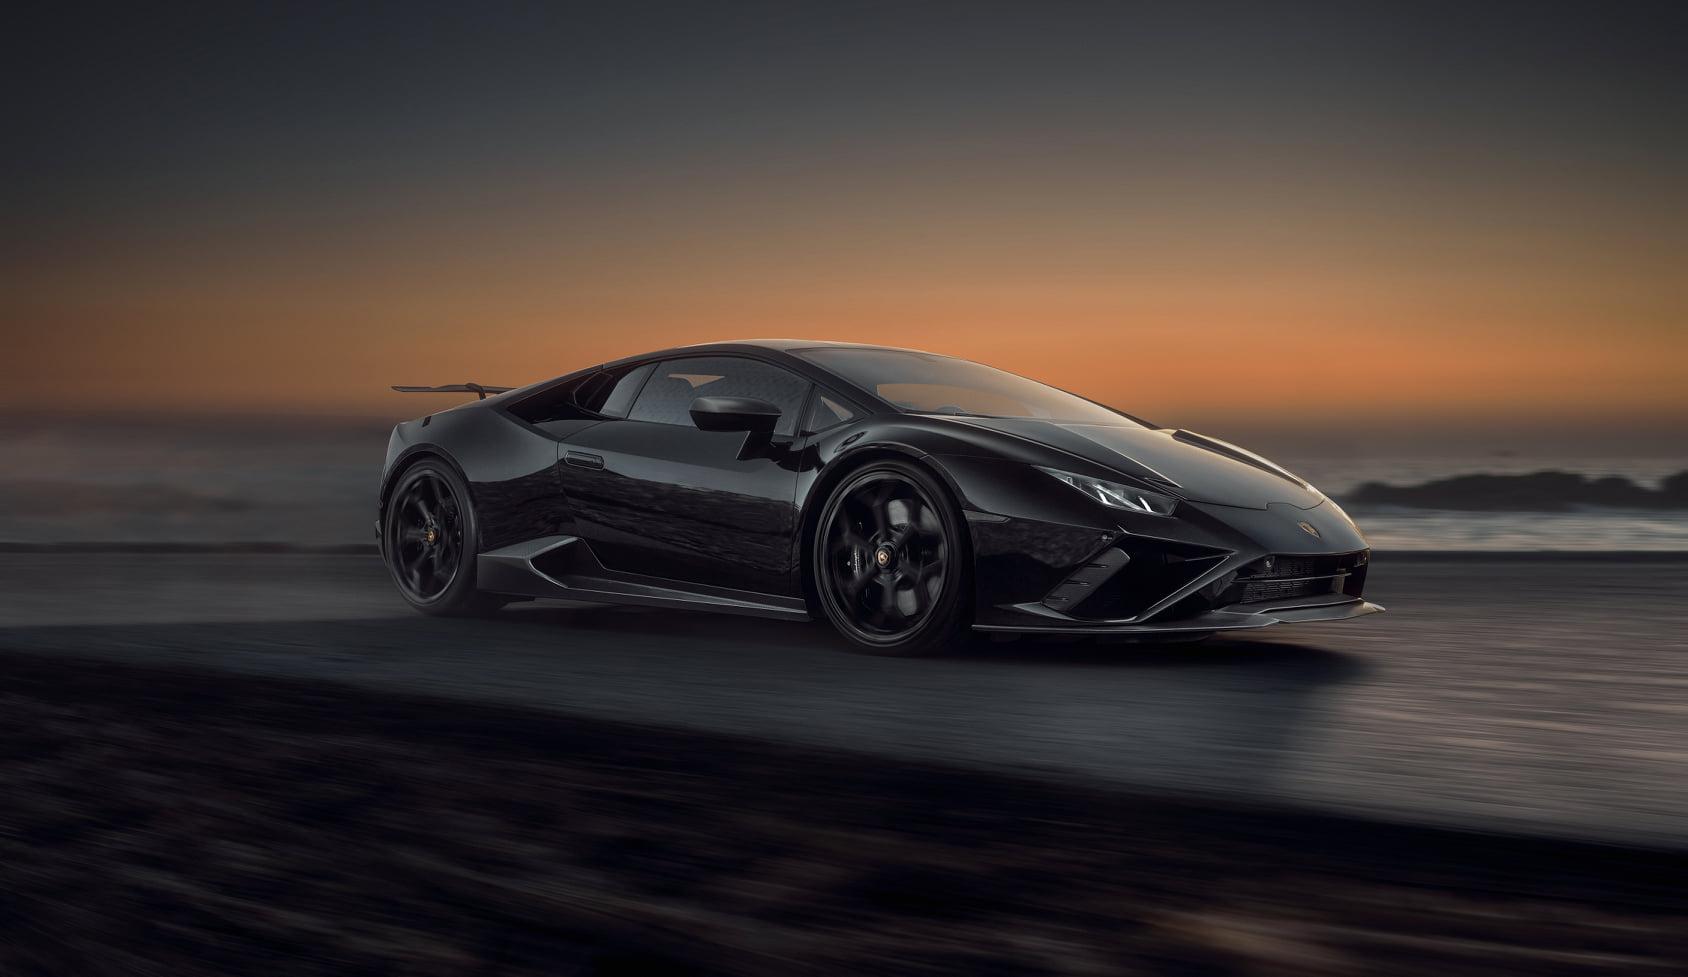 Lamborghini-Huracan-Evo-RWD-by-Novitec-6